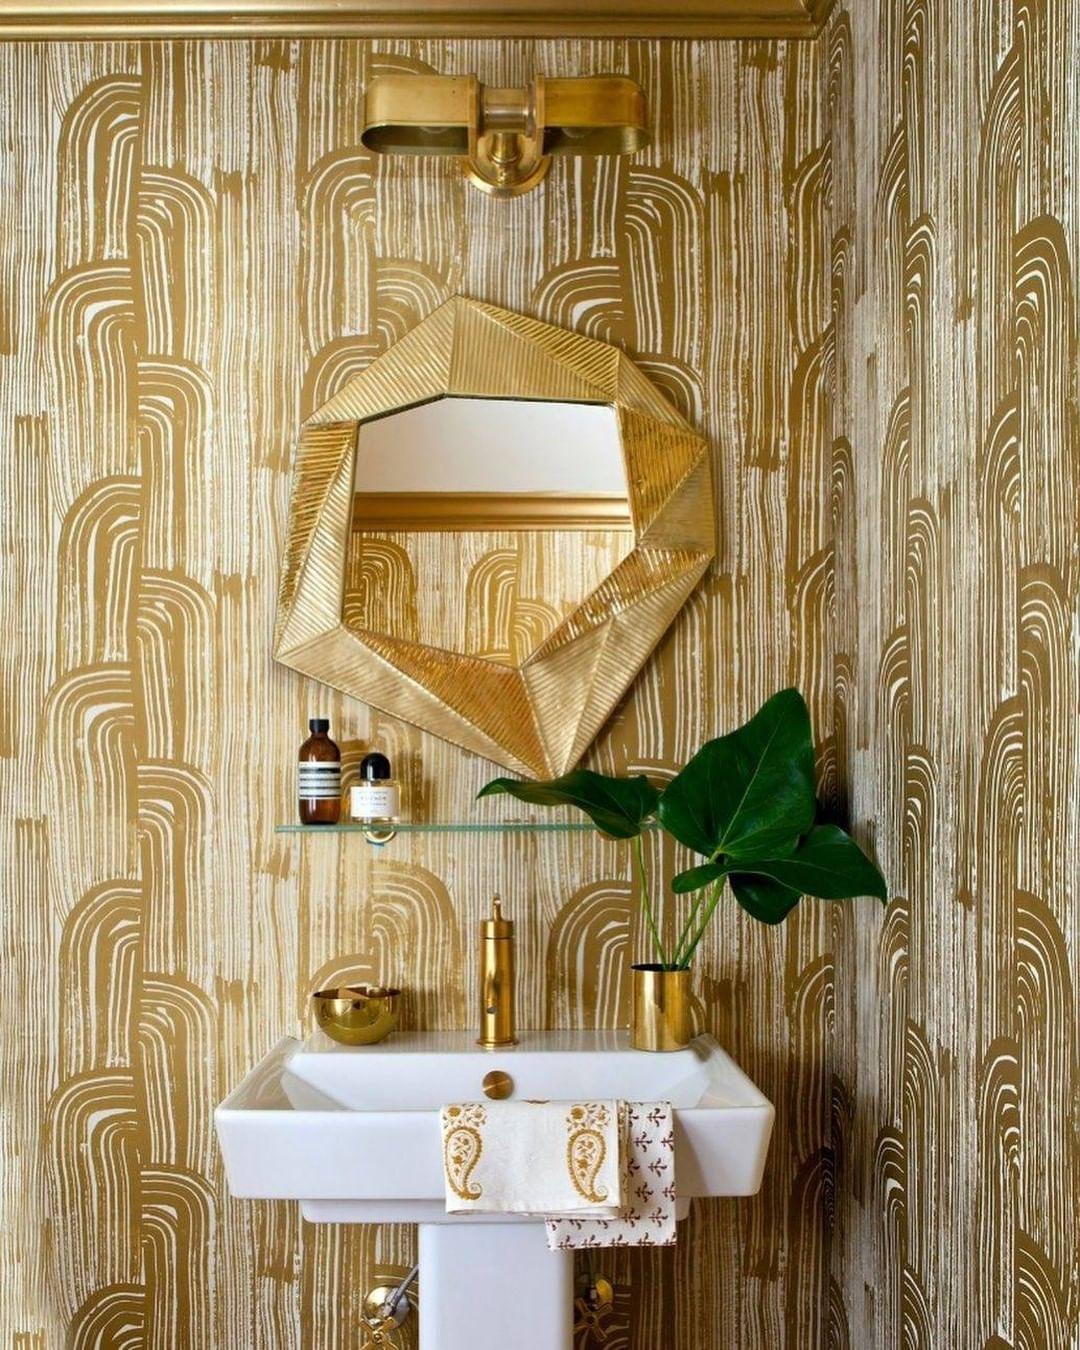 Gold Colorful Bathroom colorful bathroom Colorful Bathrooms: Discover The Latest Bathroom Color Ideas 193783599 536665190827468 8335356784845417122 n